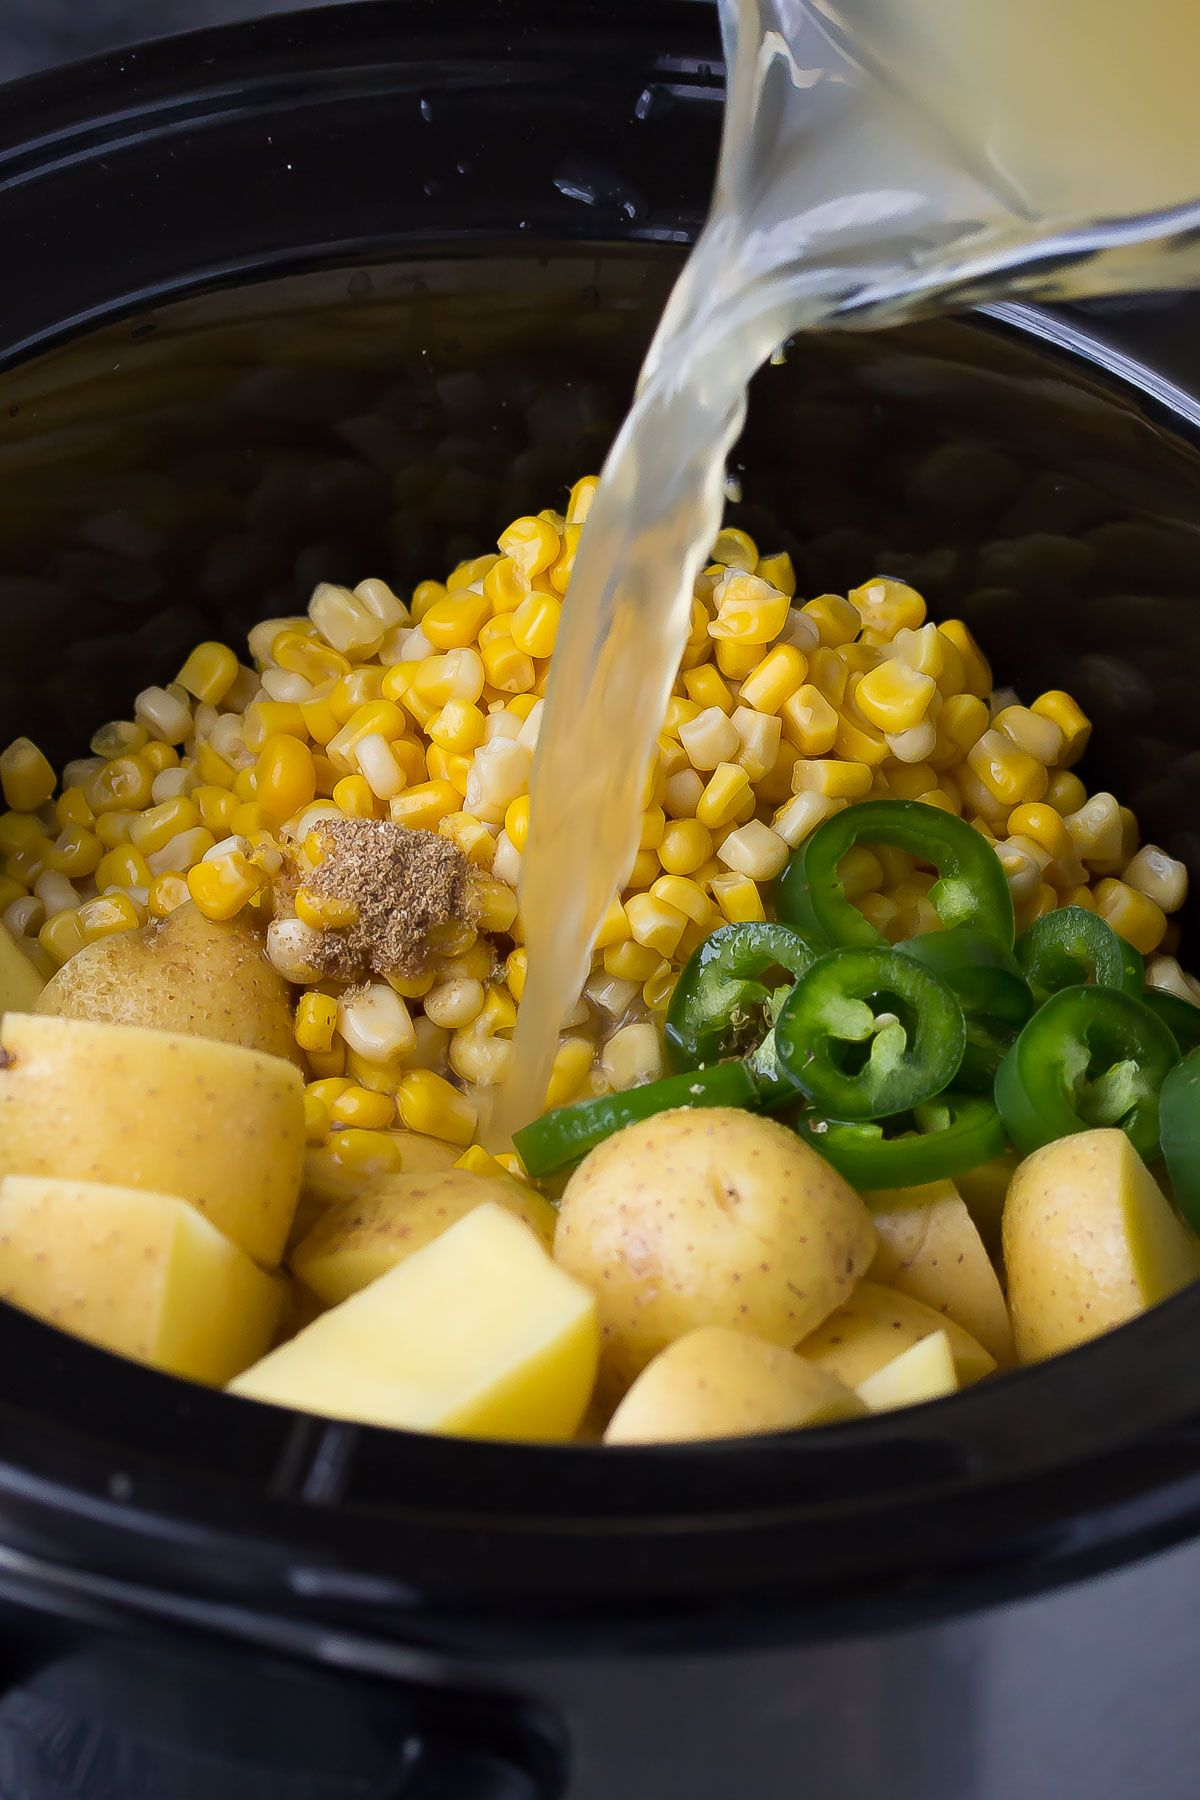 Creamy Slow Cooker Potato Corn Soup Vegan Recipe Vegan Slow Cooker Recipes Vegan Slow Cooker Vegetarian Crockpot